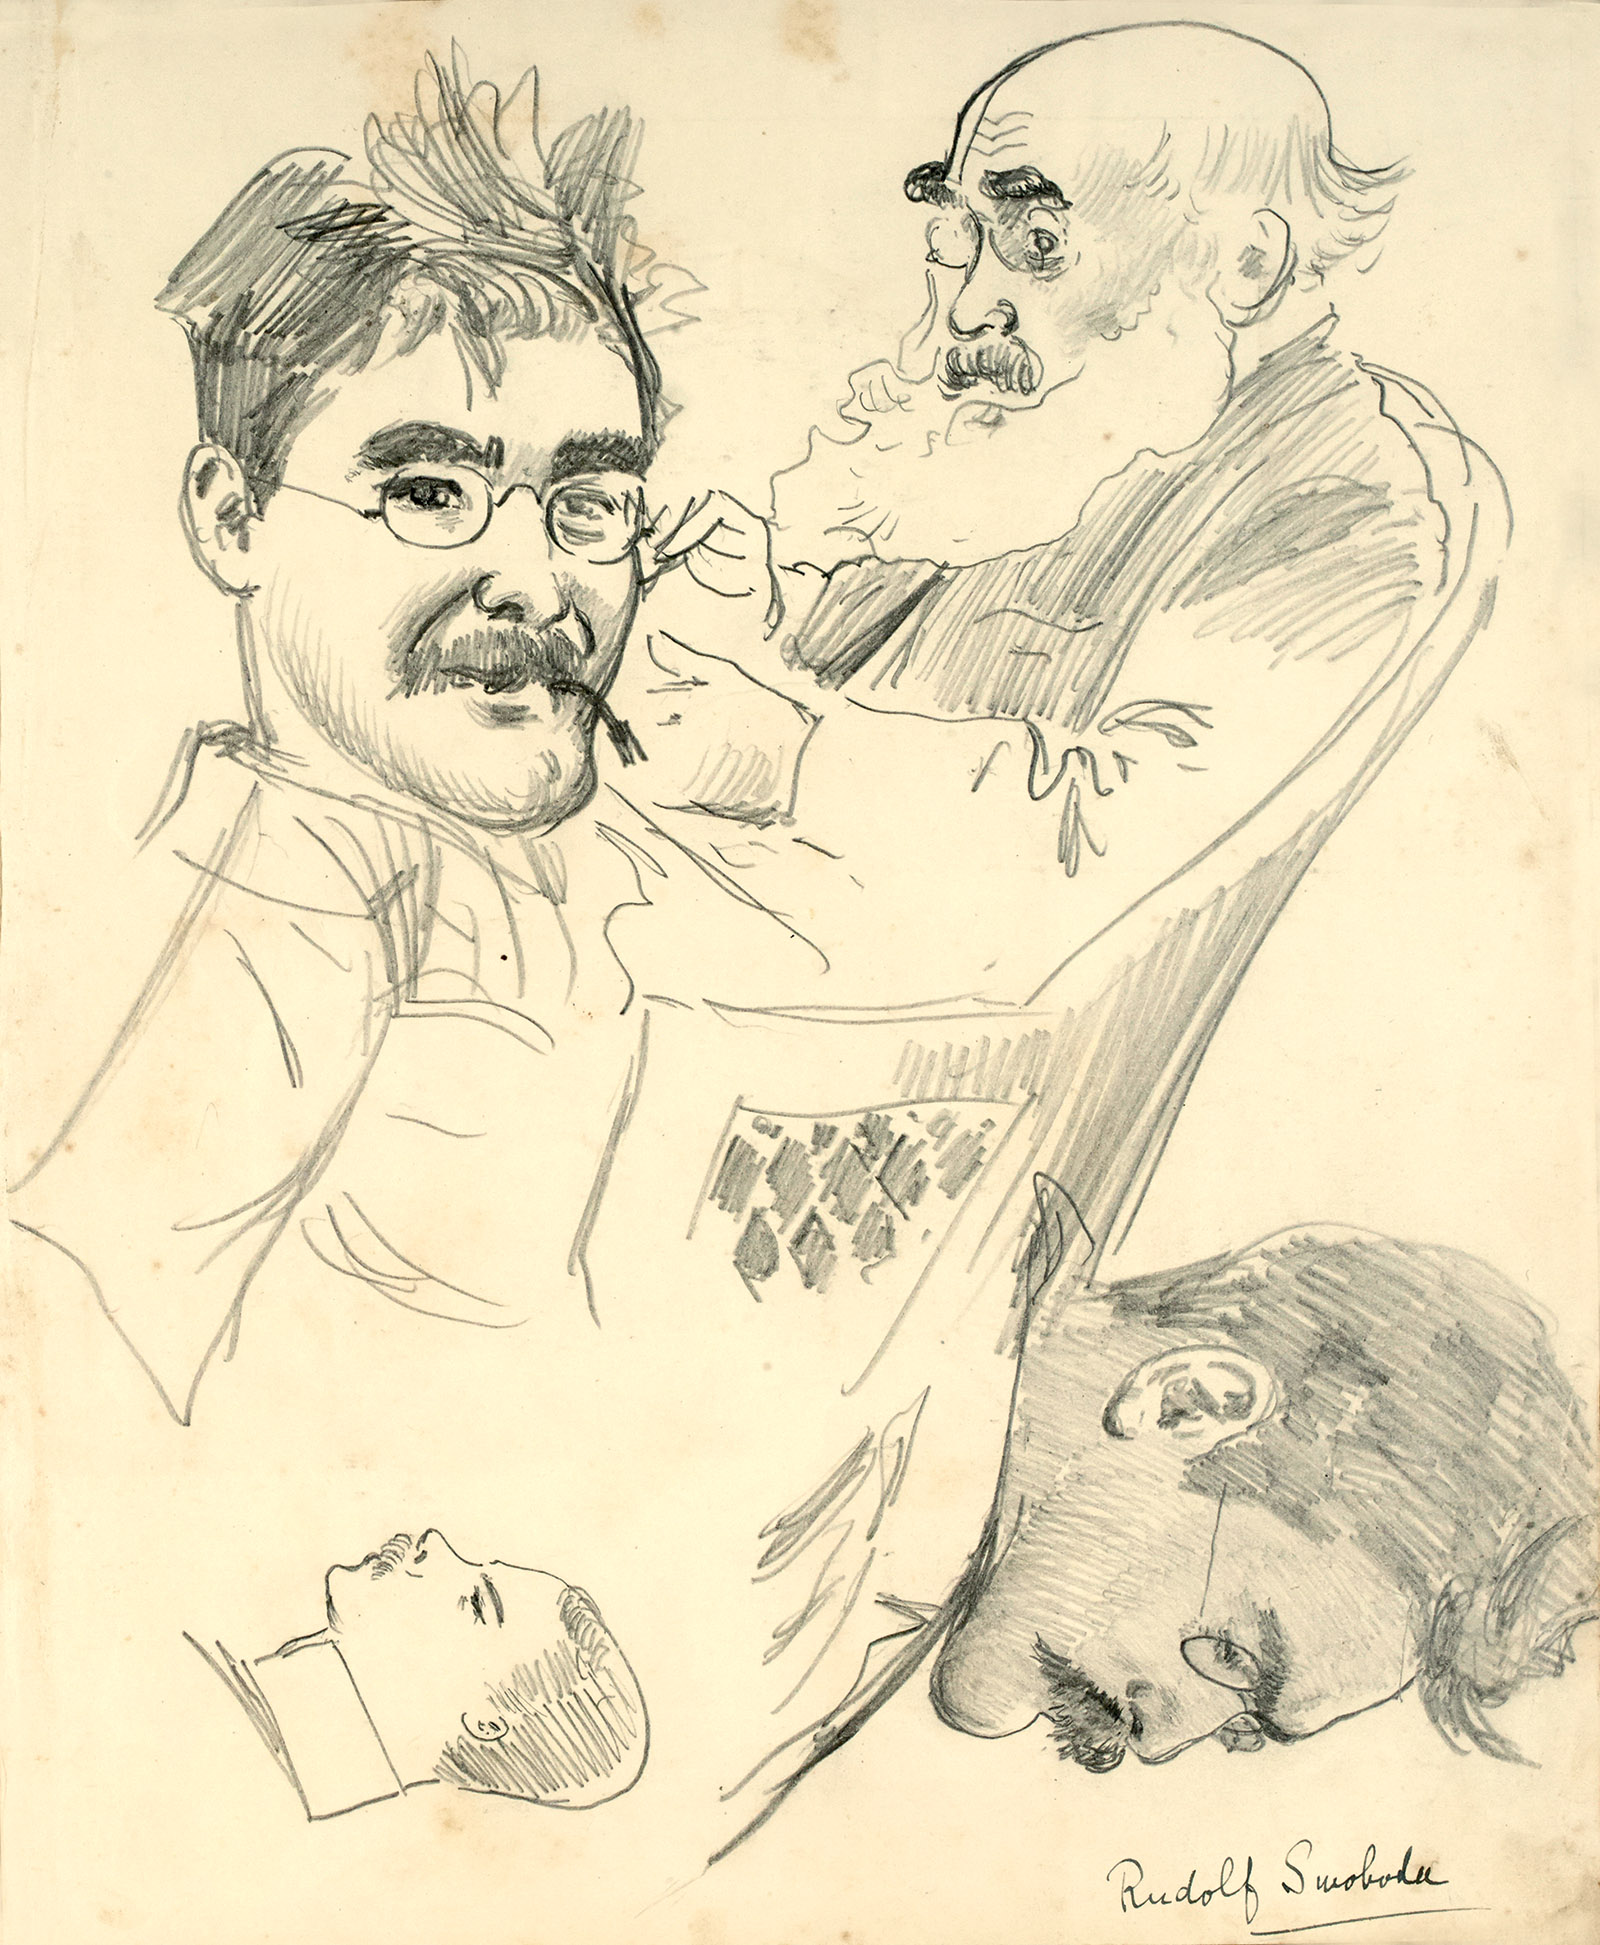 Rudolf Swoboda: Sketch of John Lockwood Kipling and sketches of Rudyard Kipling, circa 1887–1888